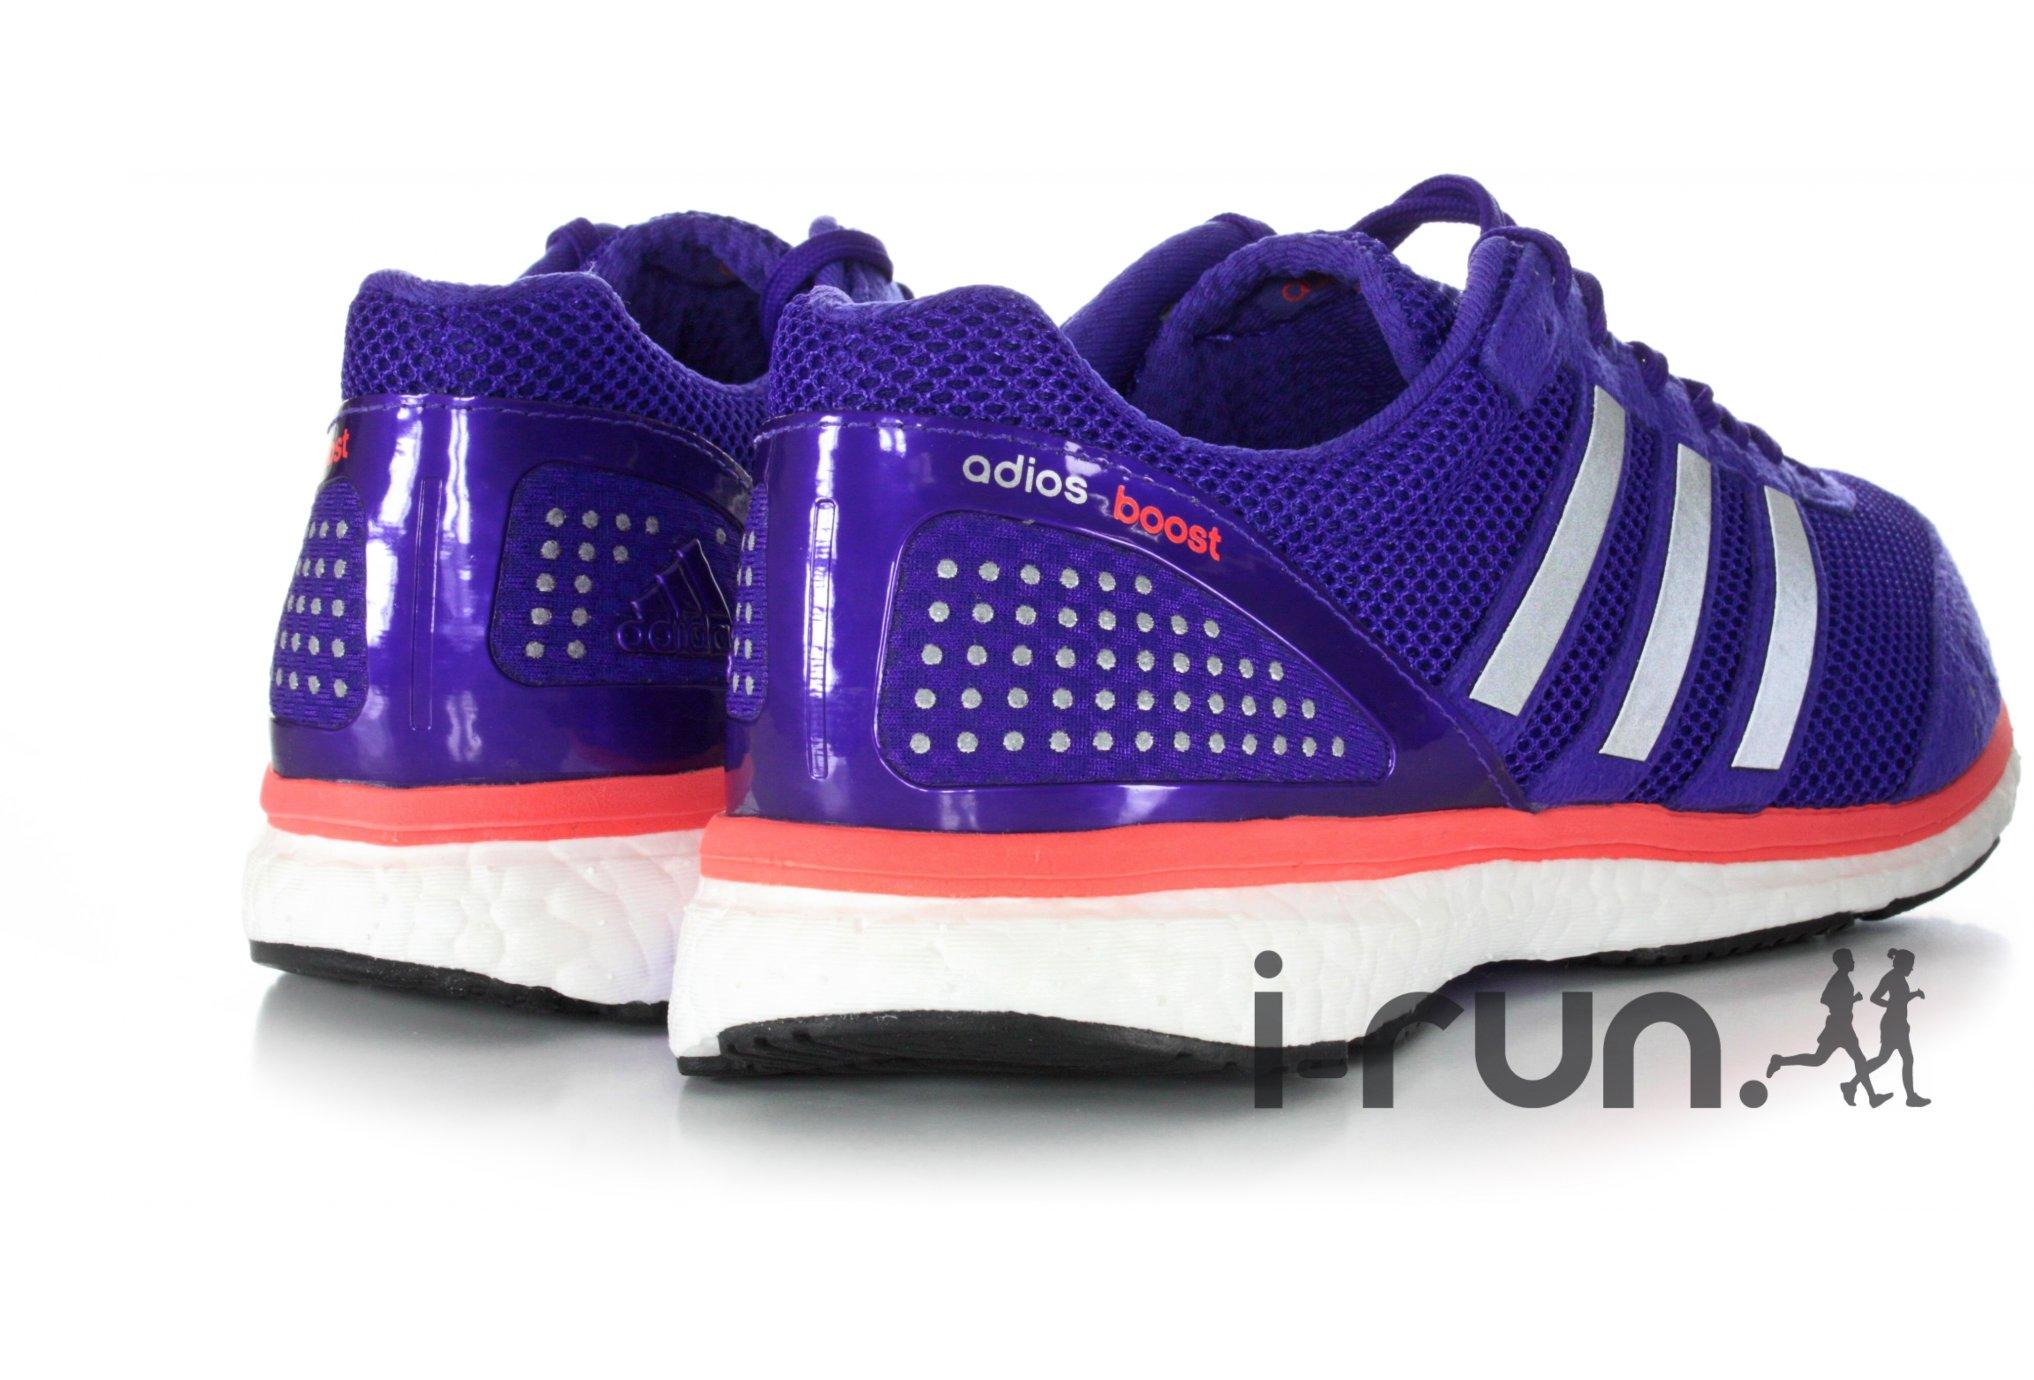 adidas boost hommes running